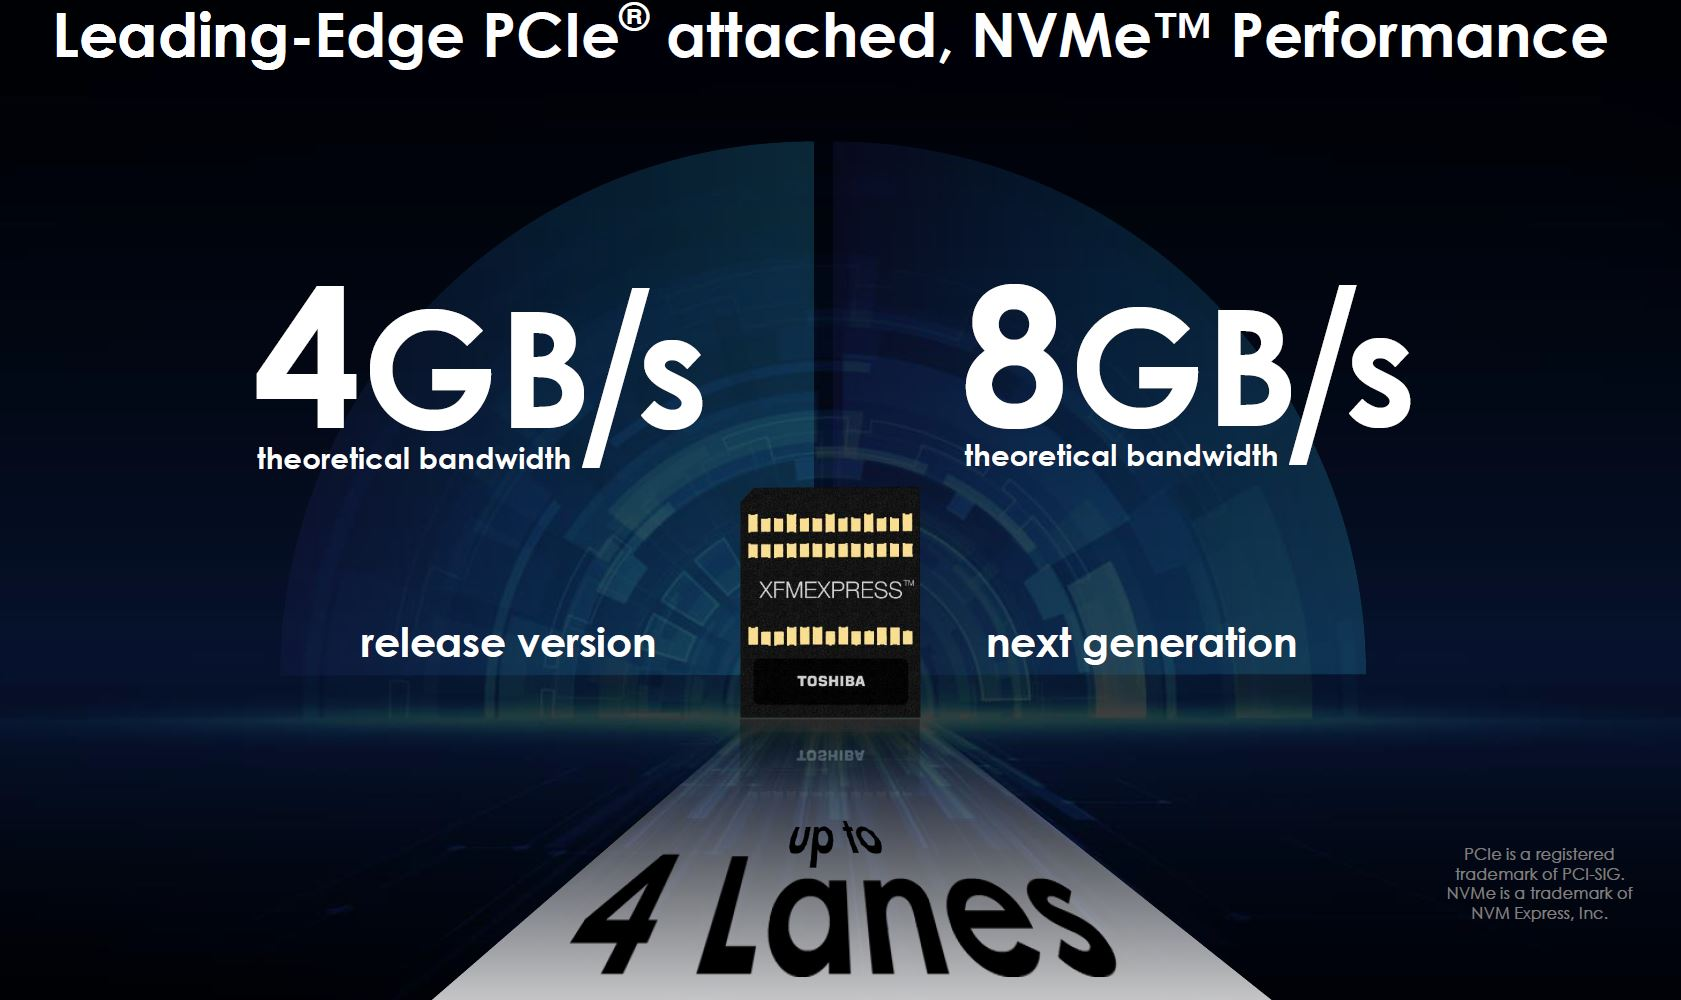 Toshiba XFMEXPRESS PCIe Gen3 And Gen4 Speeds